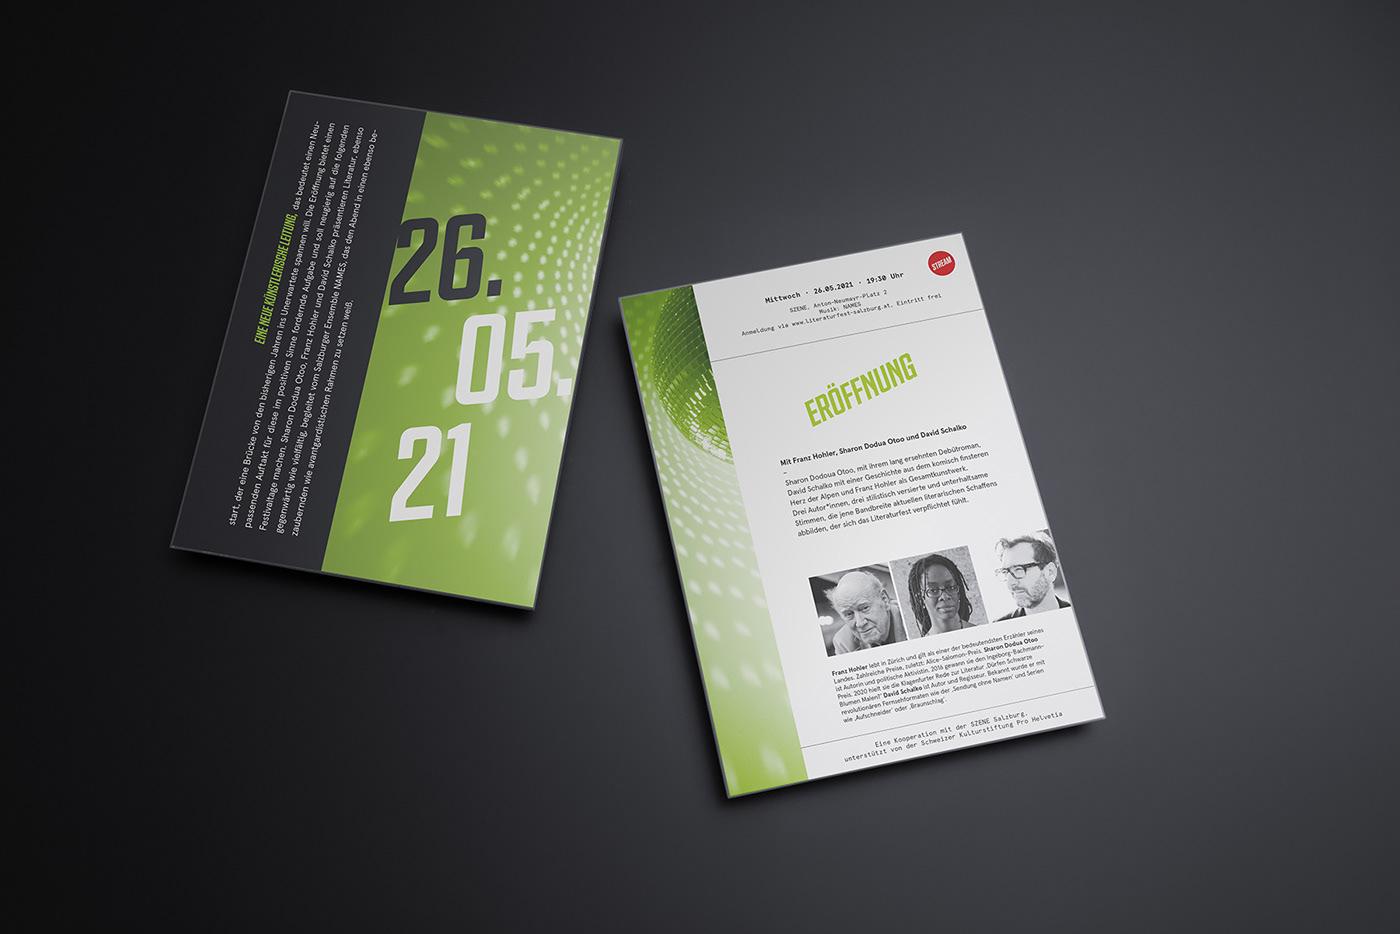 graphicdesign postercampaign posterdesign posters printdesign wirsindartisten